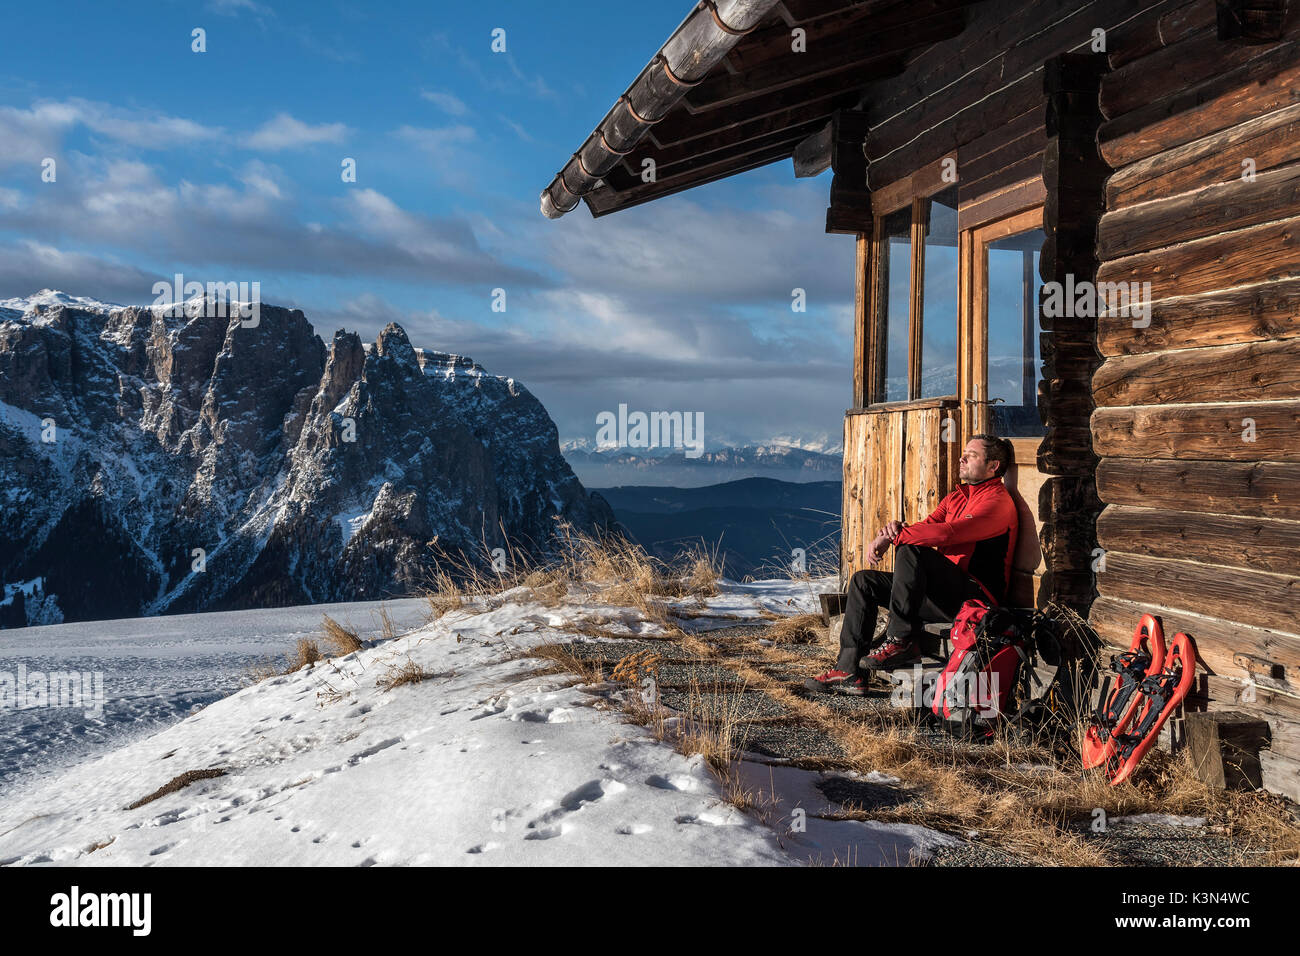 Alpe di Siusi/Seiser Alm, Dolomites, South Tyrol, Italy. Short break - Stock Image